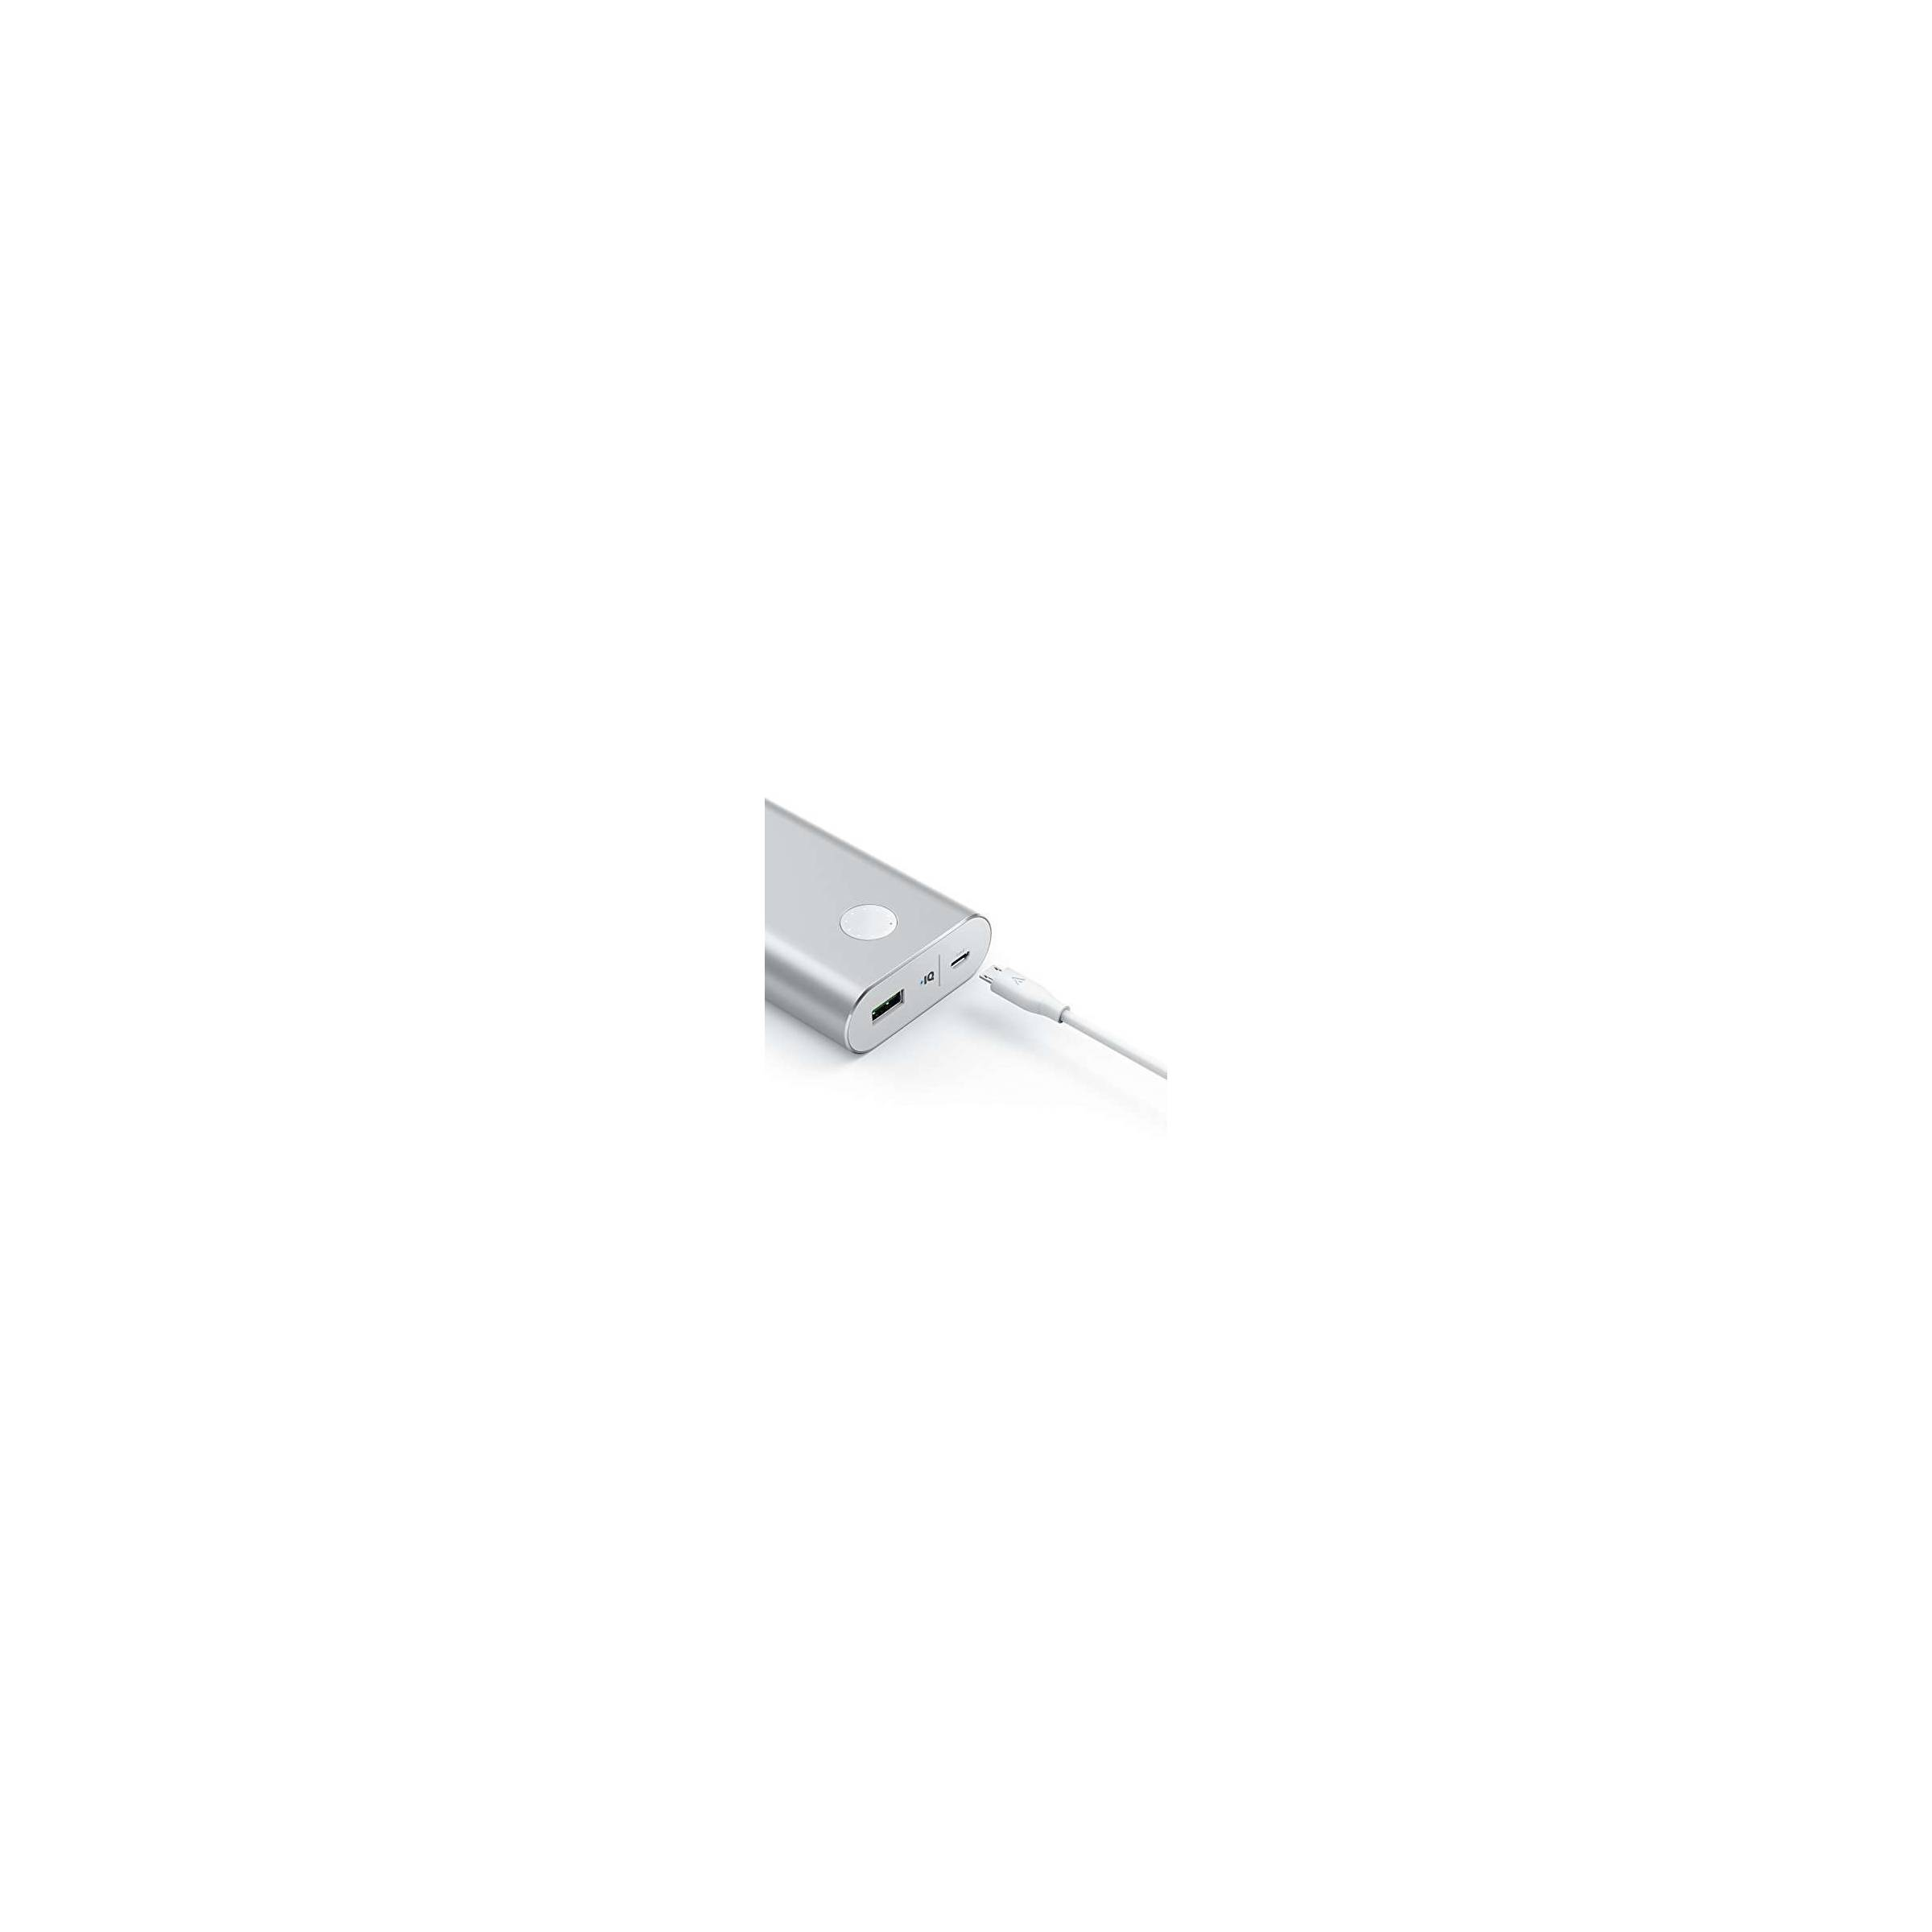 anker Anker powercore+ 10 050mah powerbank quick charge 3.0 sort/sølv farve sølv farve på mackabler.dk